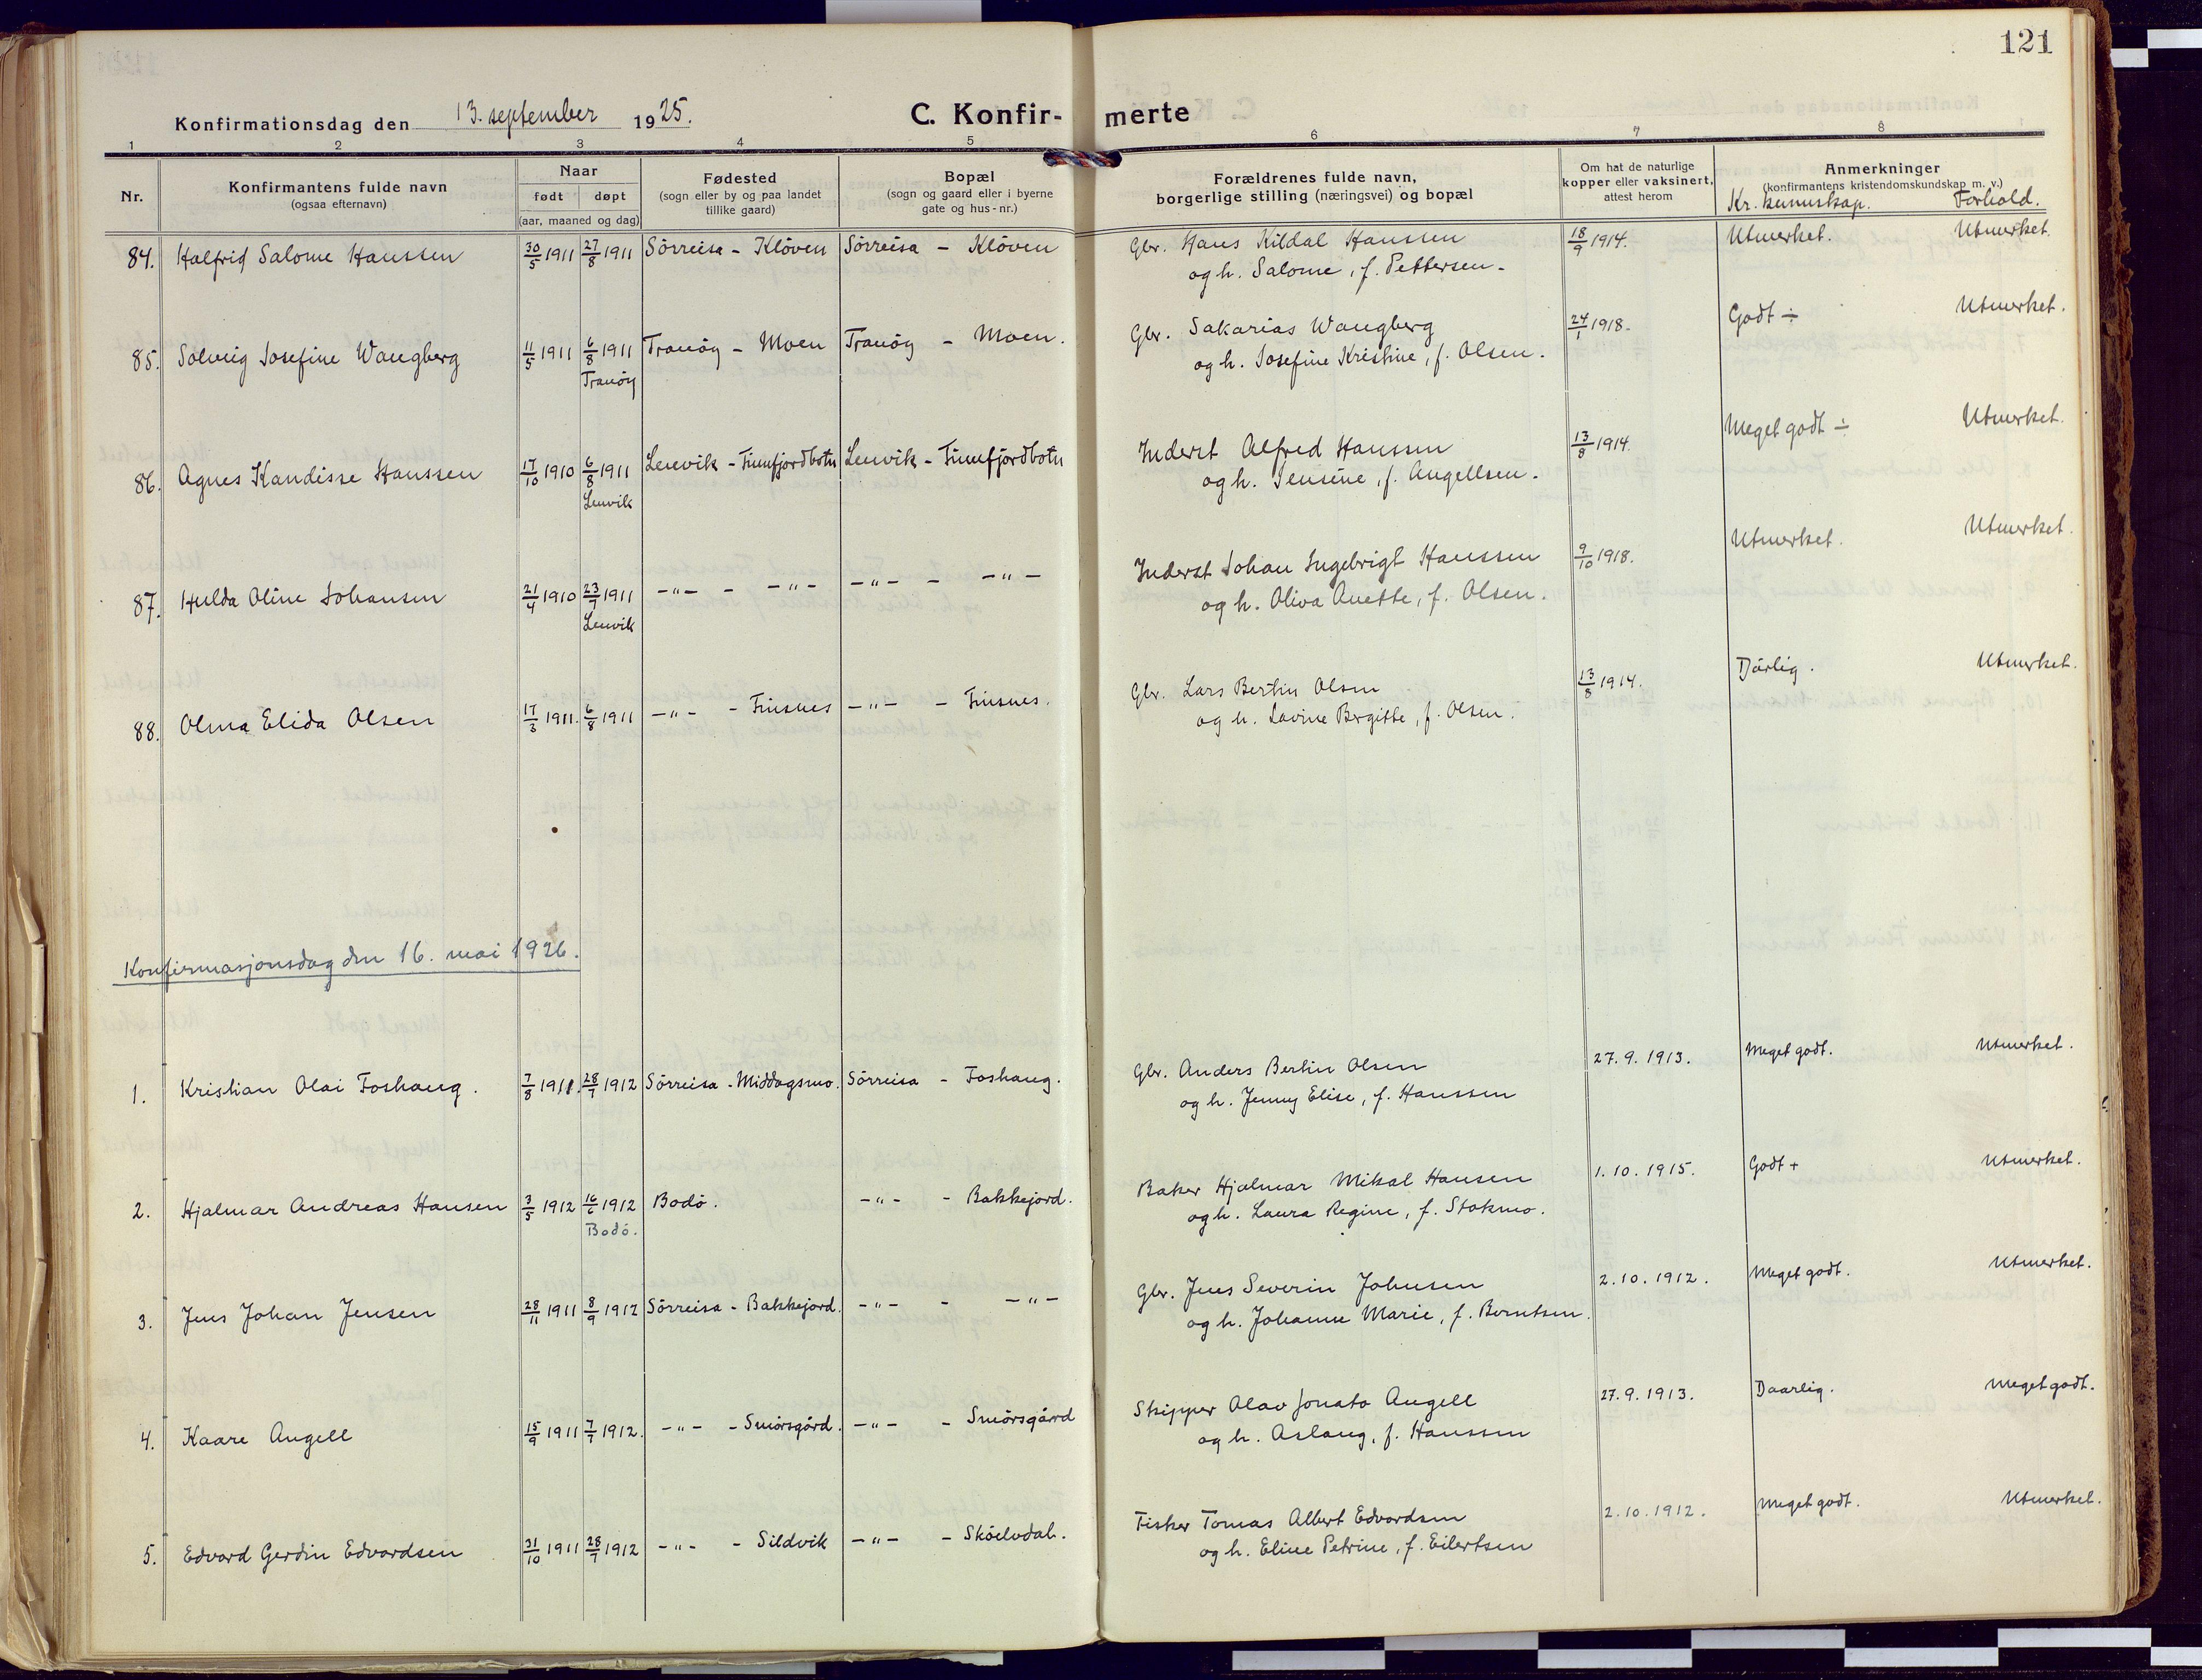 SATØ, Tranøy sokneprestkontor, I/Ia/Iaa/L0015kirke: Ministerialbok nr. 15, 1919-1928, s. 121